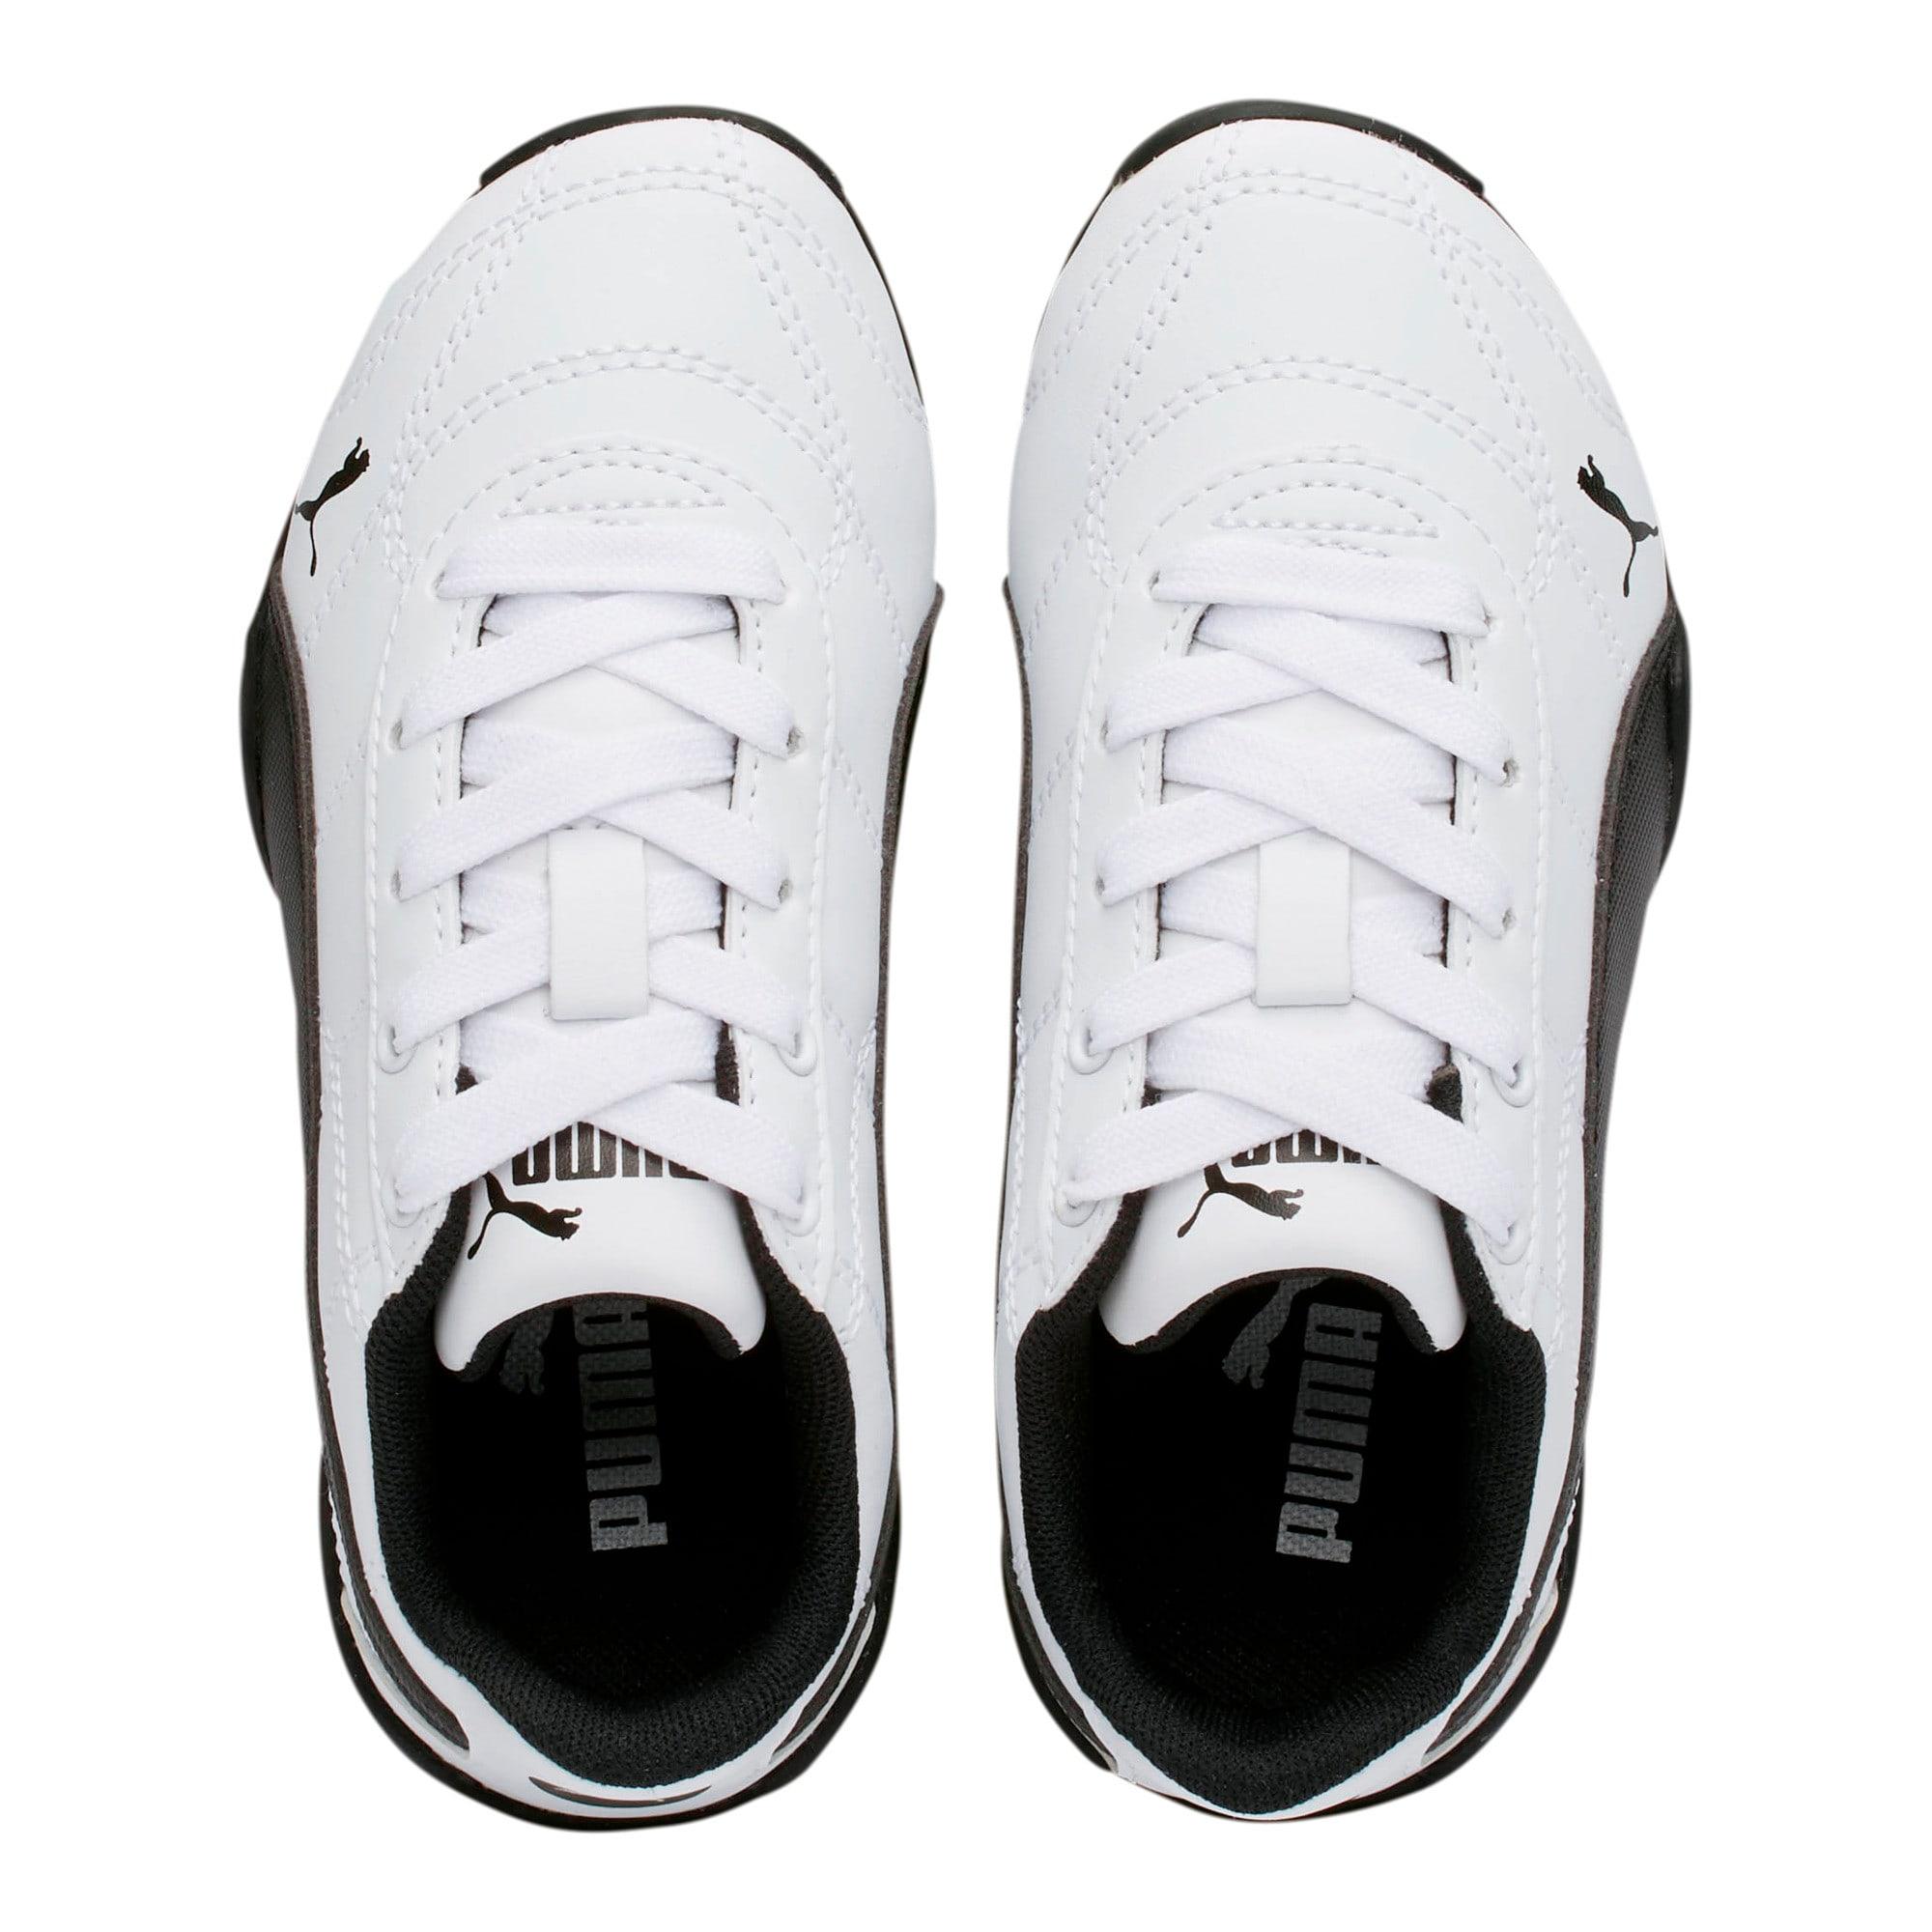 Thumbnail 6 of Tune Cat 3 Little Kids' Shoes, Puma White-Puma Black, medium